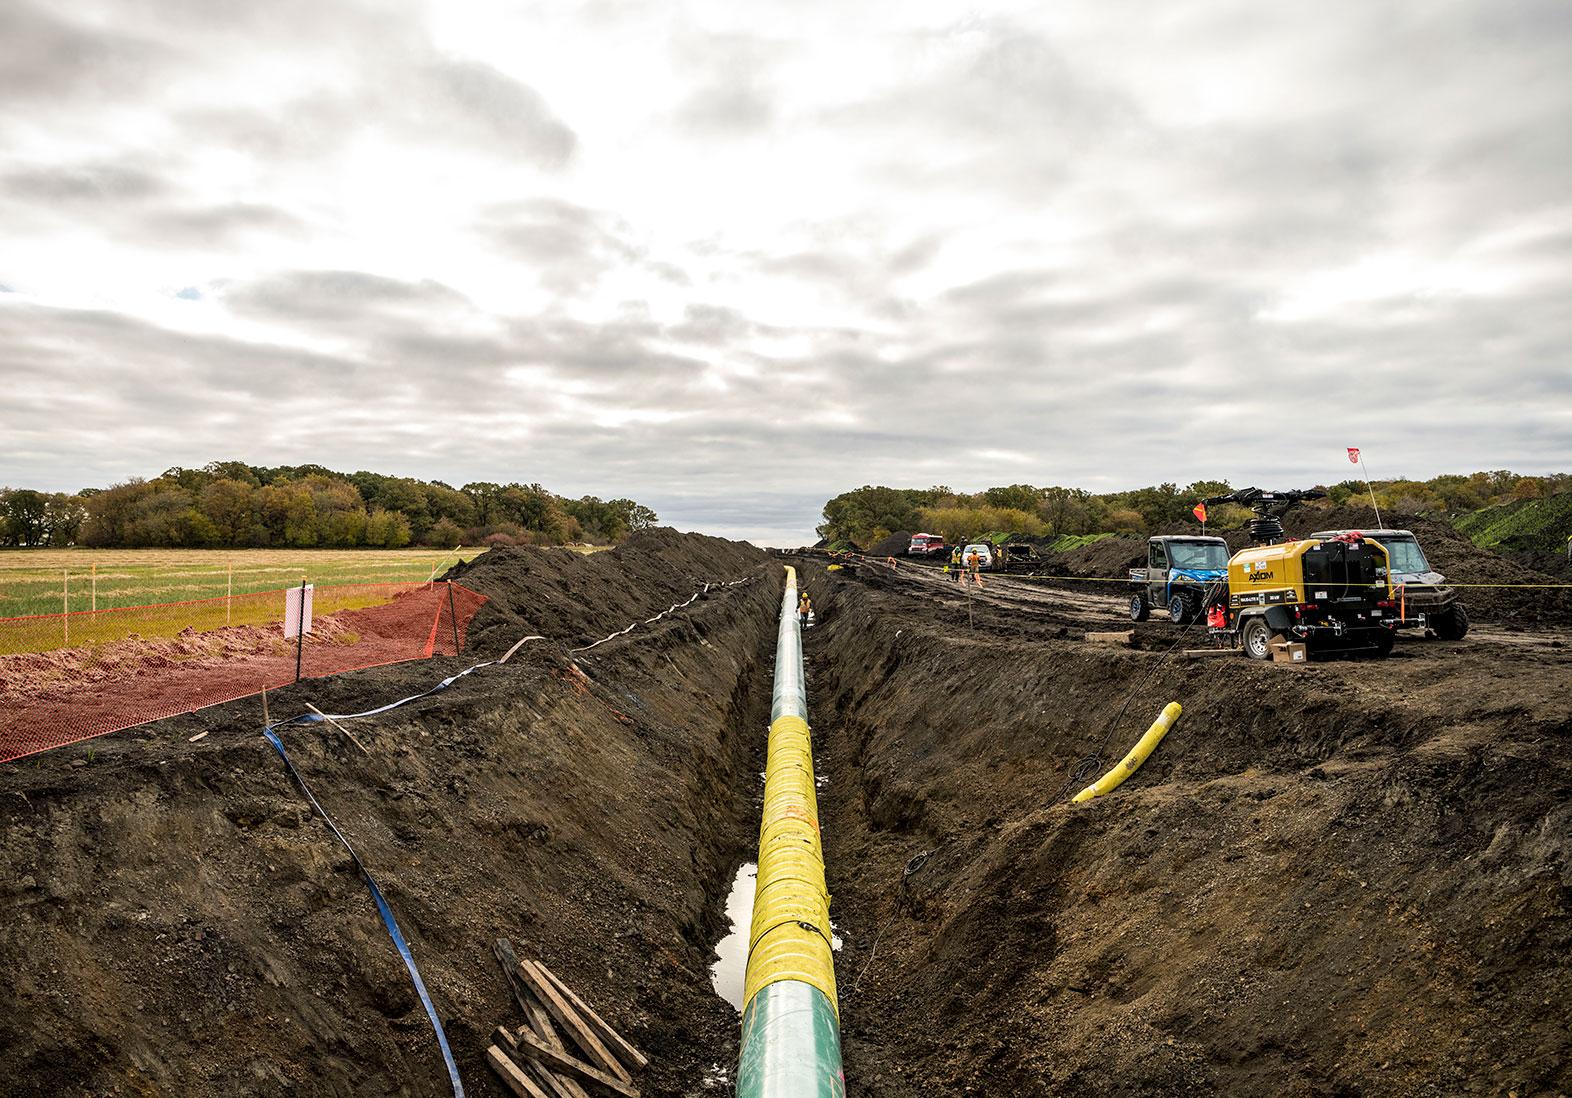 Enbridge Pipeline Landscape